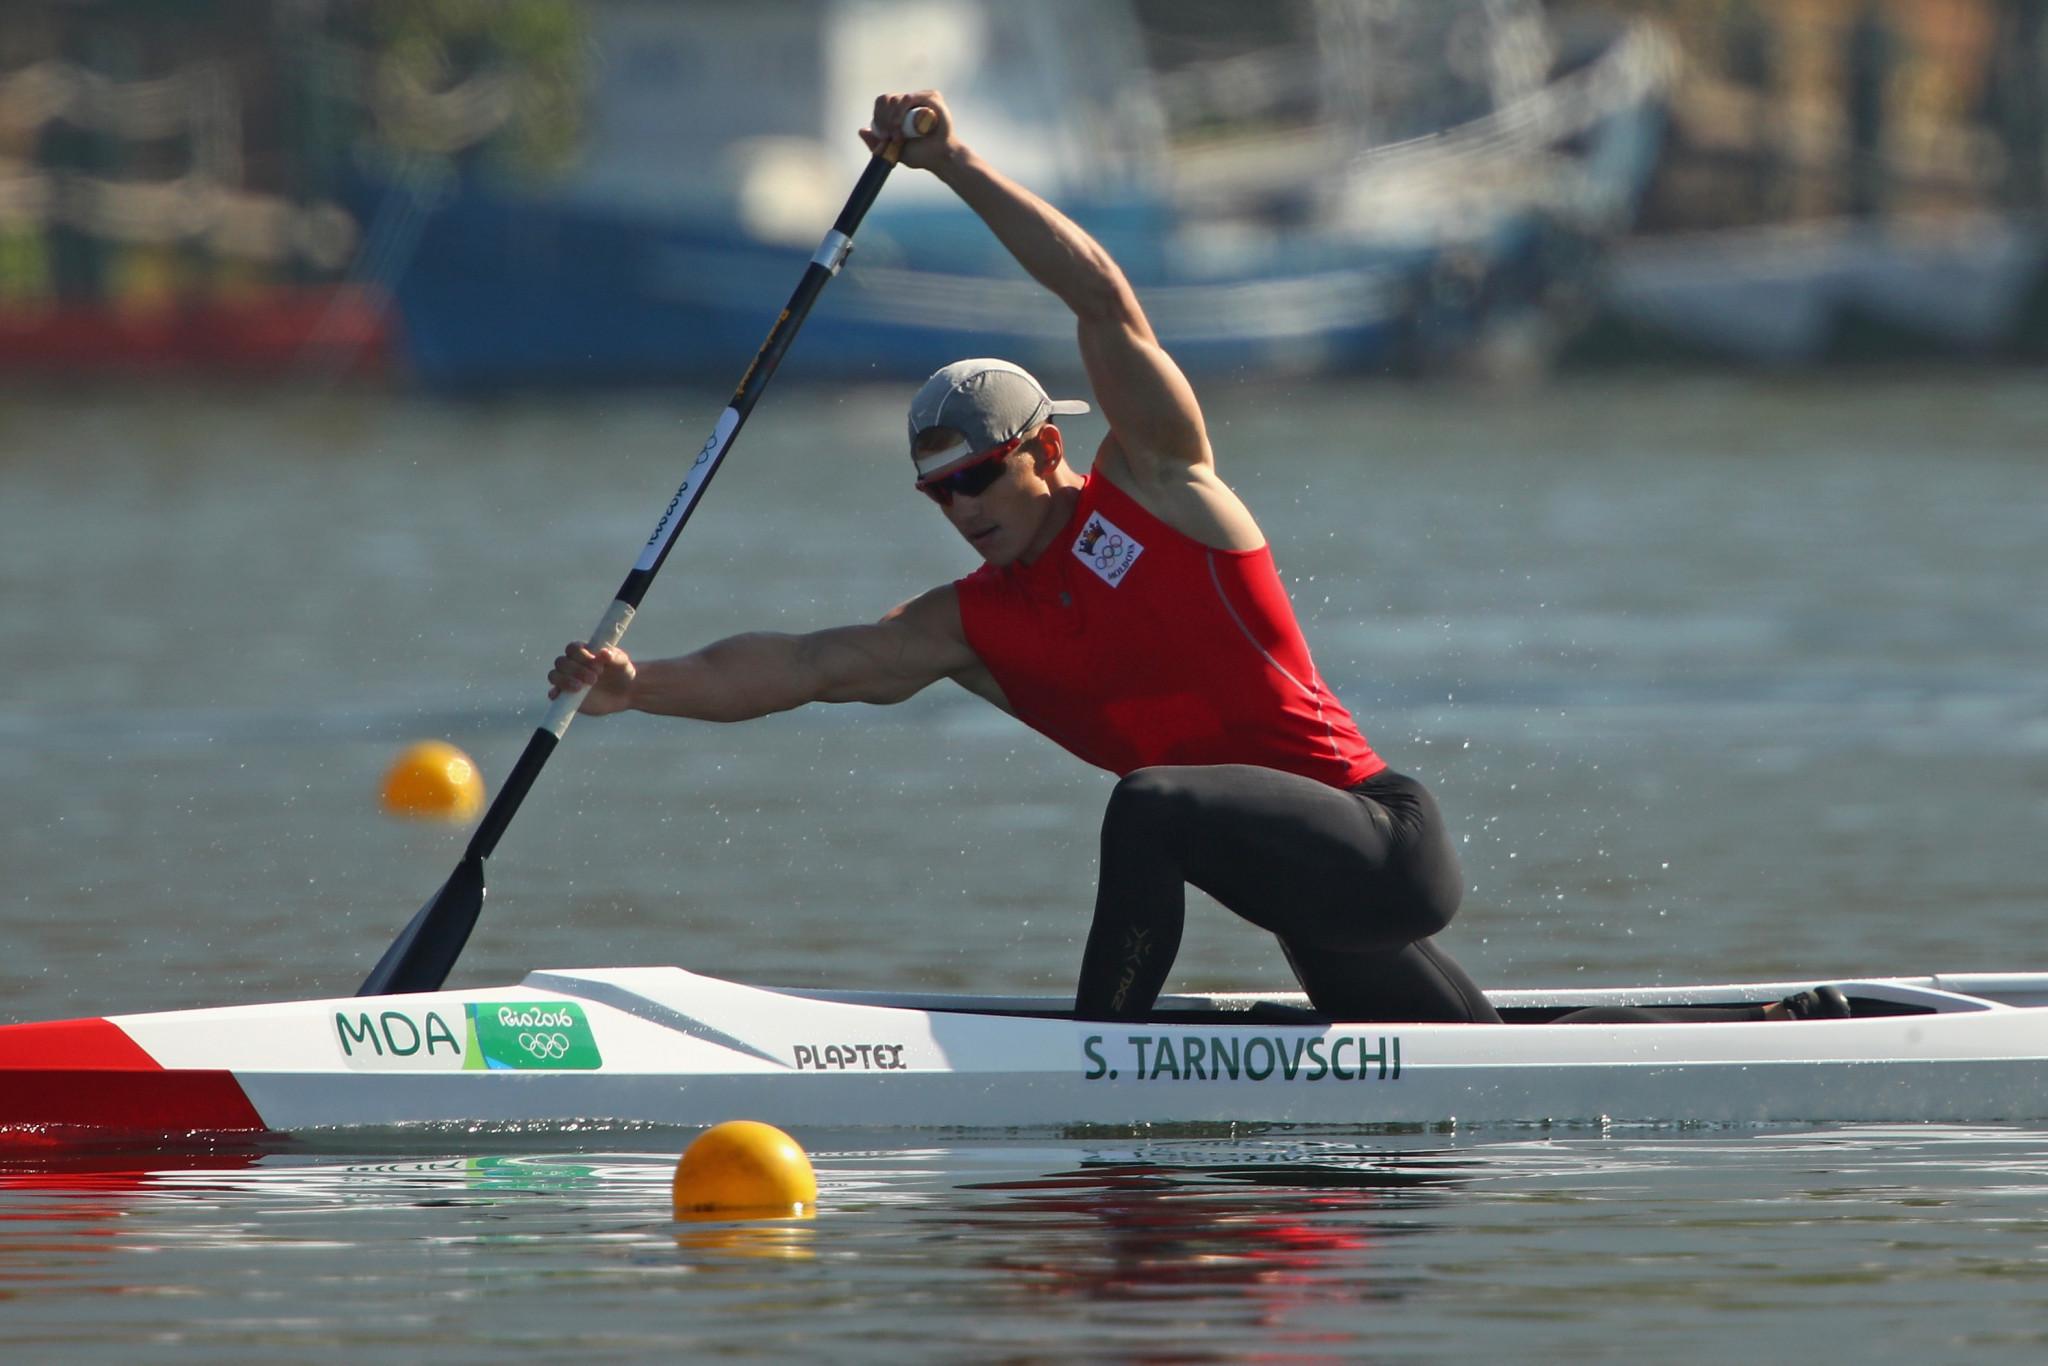 Canoeist Tarnovschi puts four-year ban behind him to seal Tokyo 2020 spot